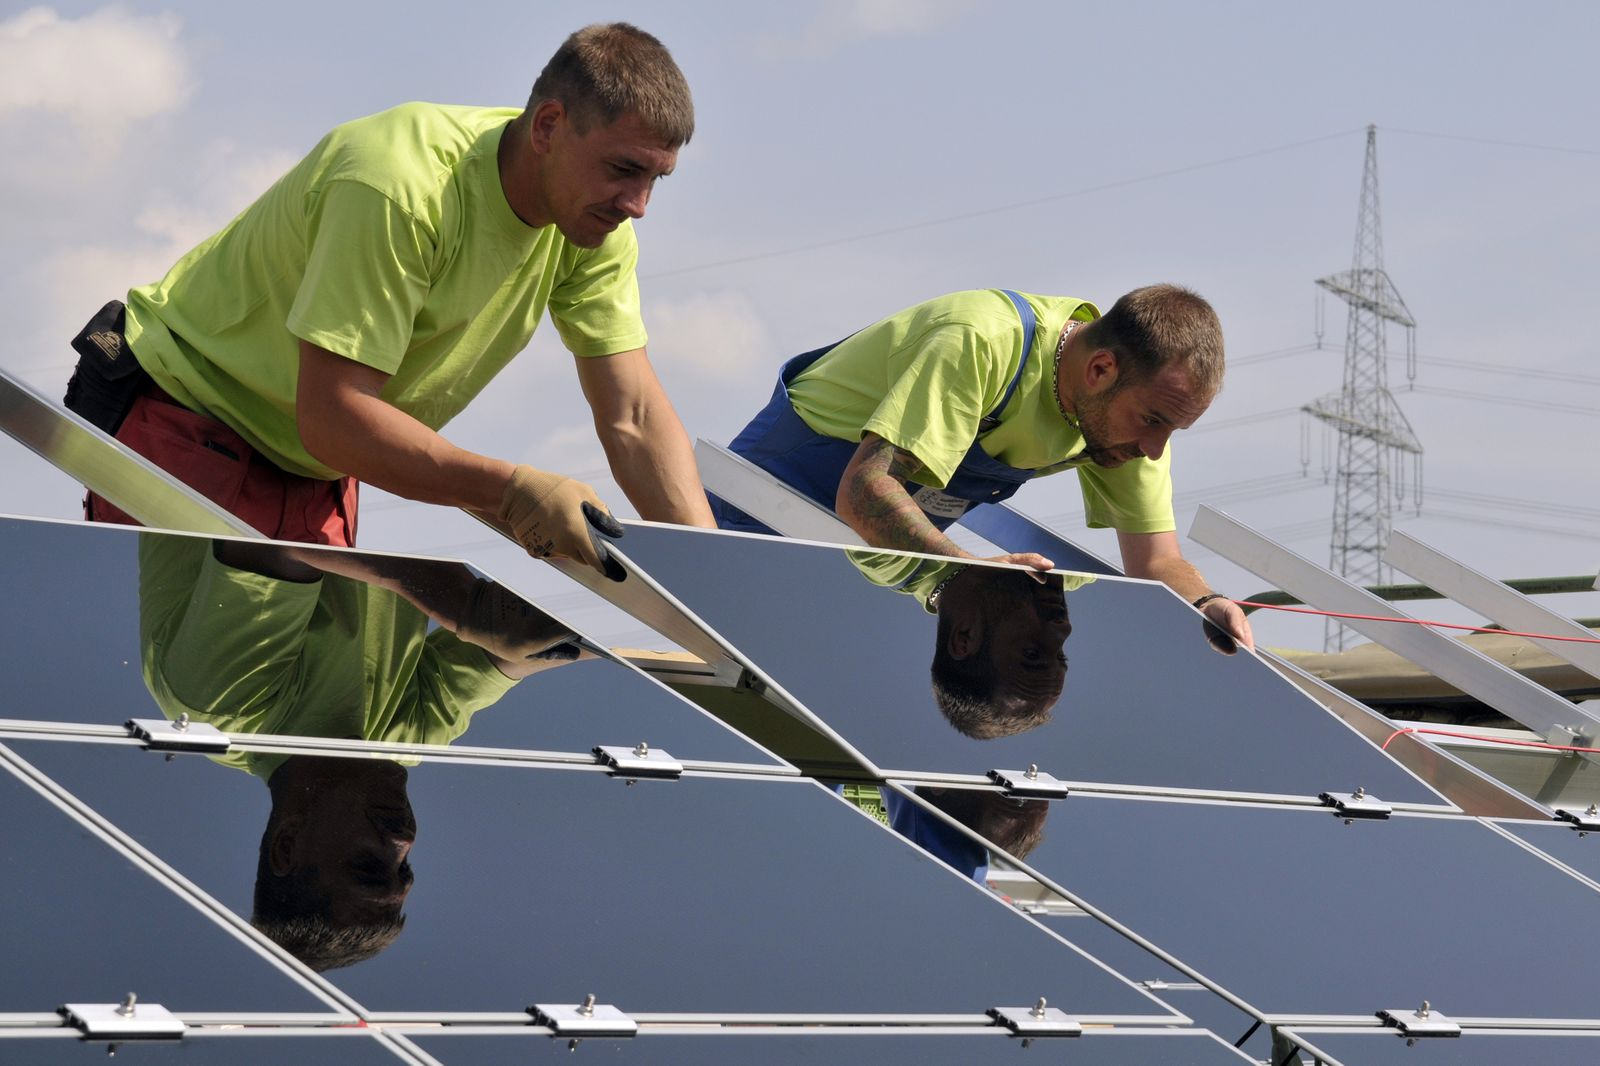 Photovolatik-Park Aichach+ / Solarenergie / Solaranlage / Sonnenenergie